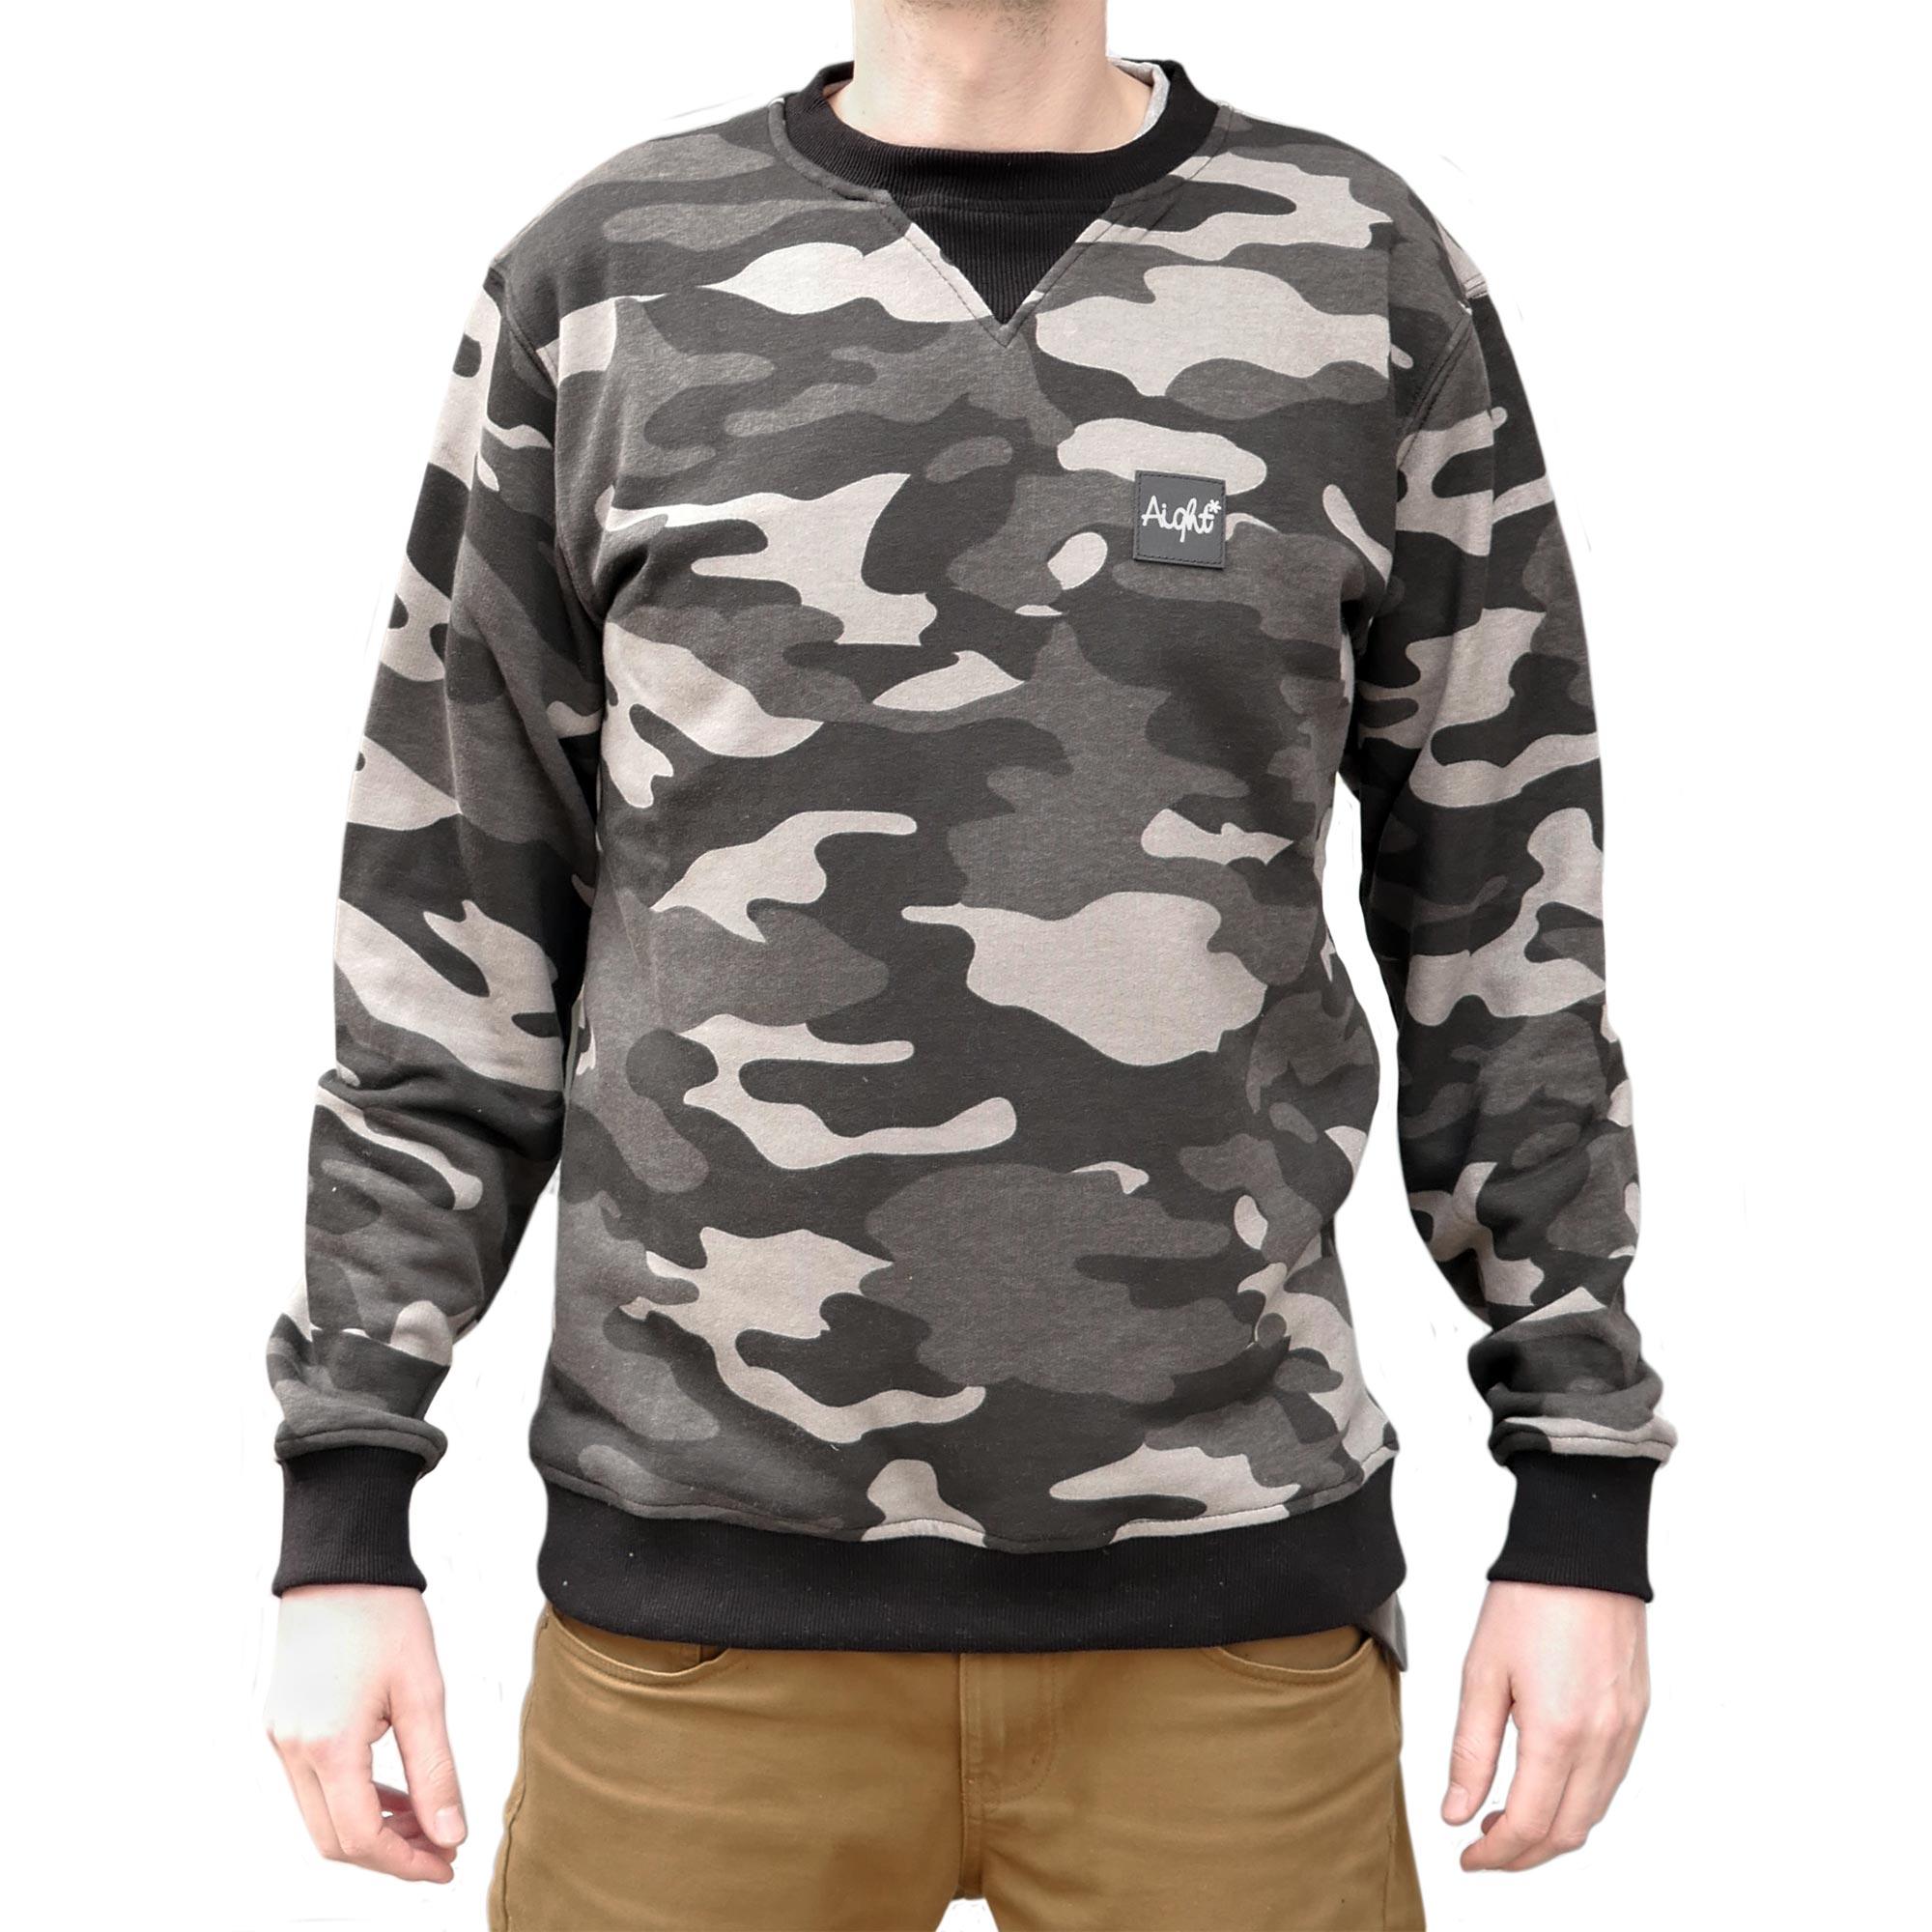 Details zu Aight Evolution Sweatshirt Camo Laight